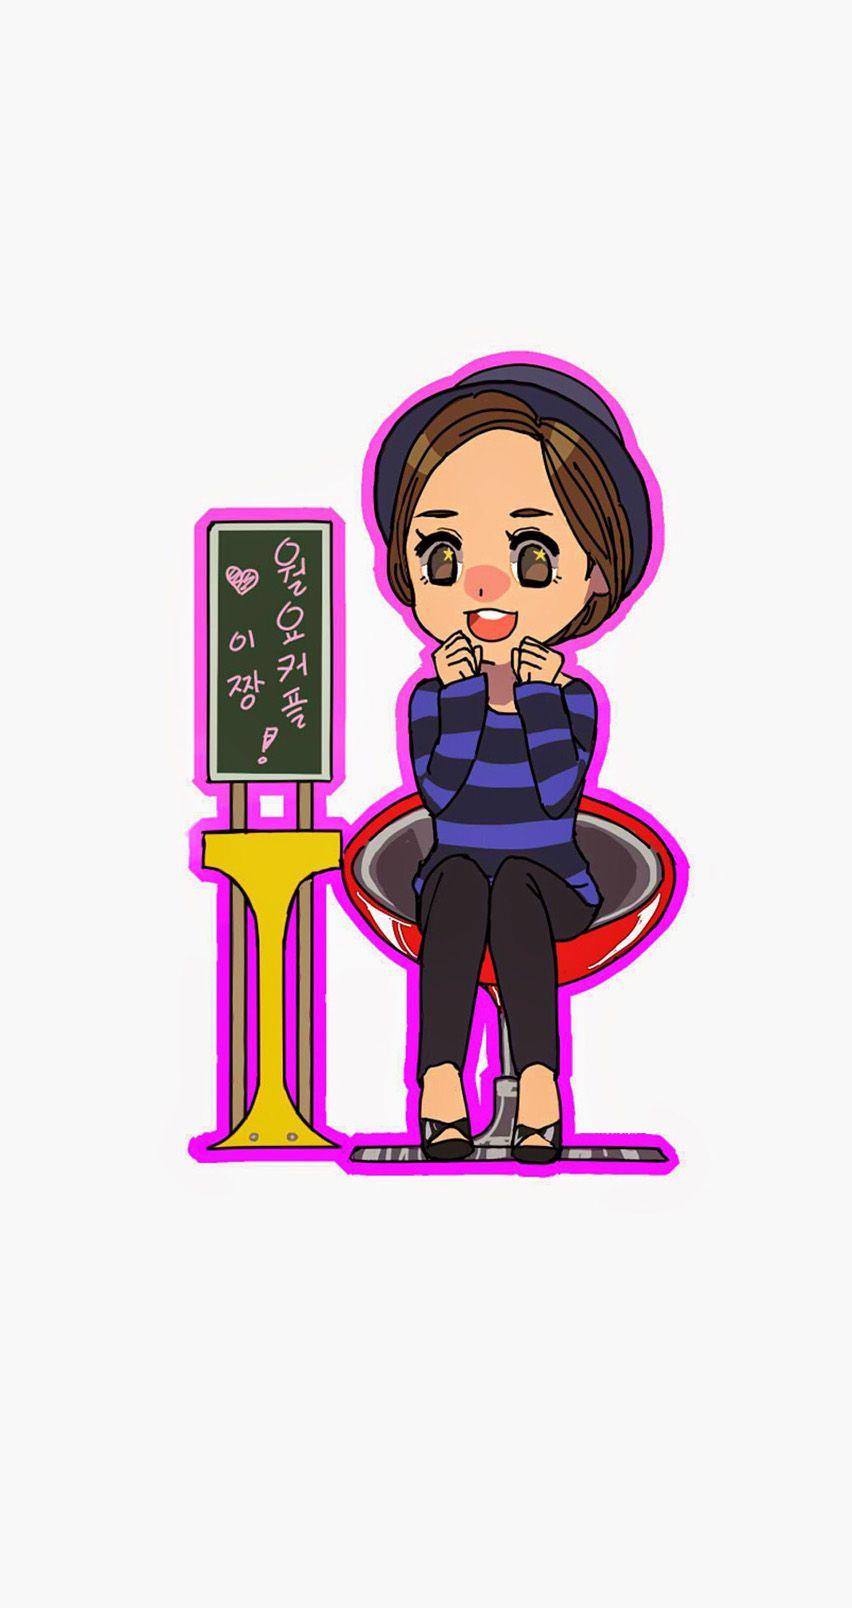 Wallpaper iphone korea - Korean Running Man Cute Cartoon Ji Hyo Wallpapers For Iphone Mobile9 Fanart